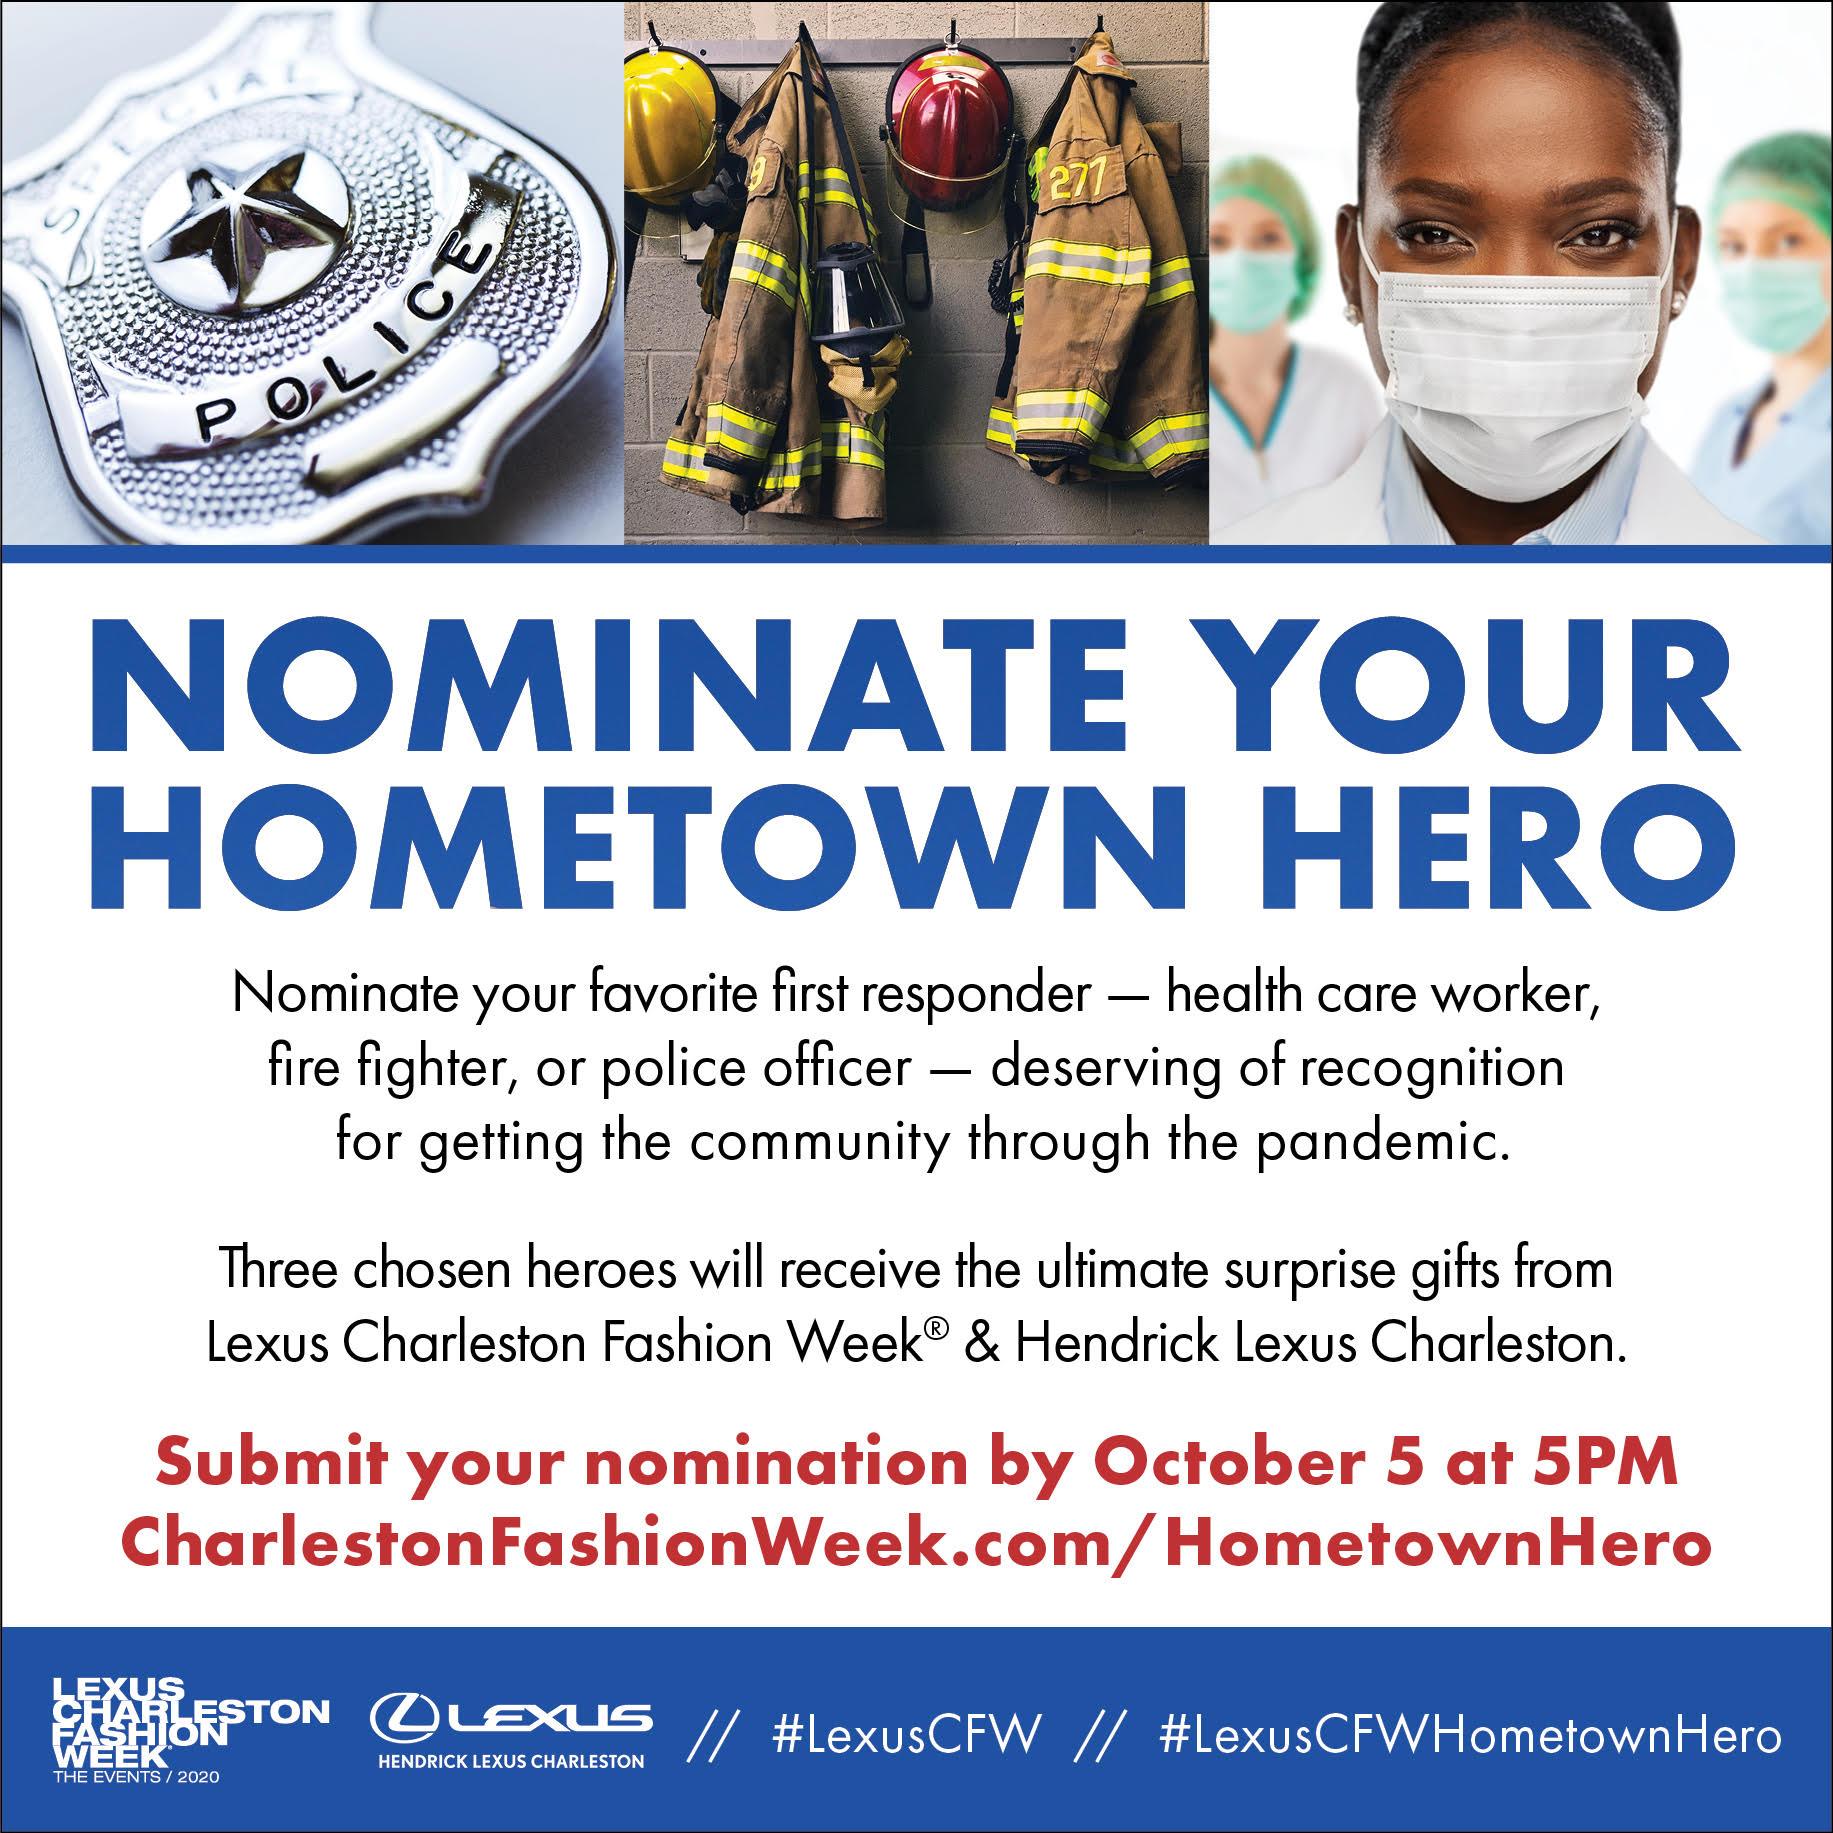 Nominate Your Hometown Hero